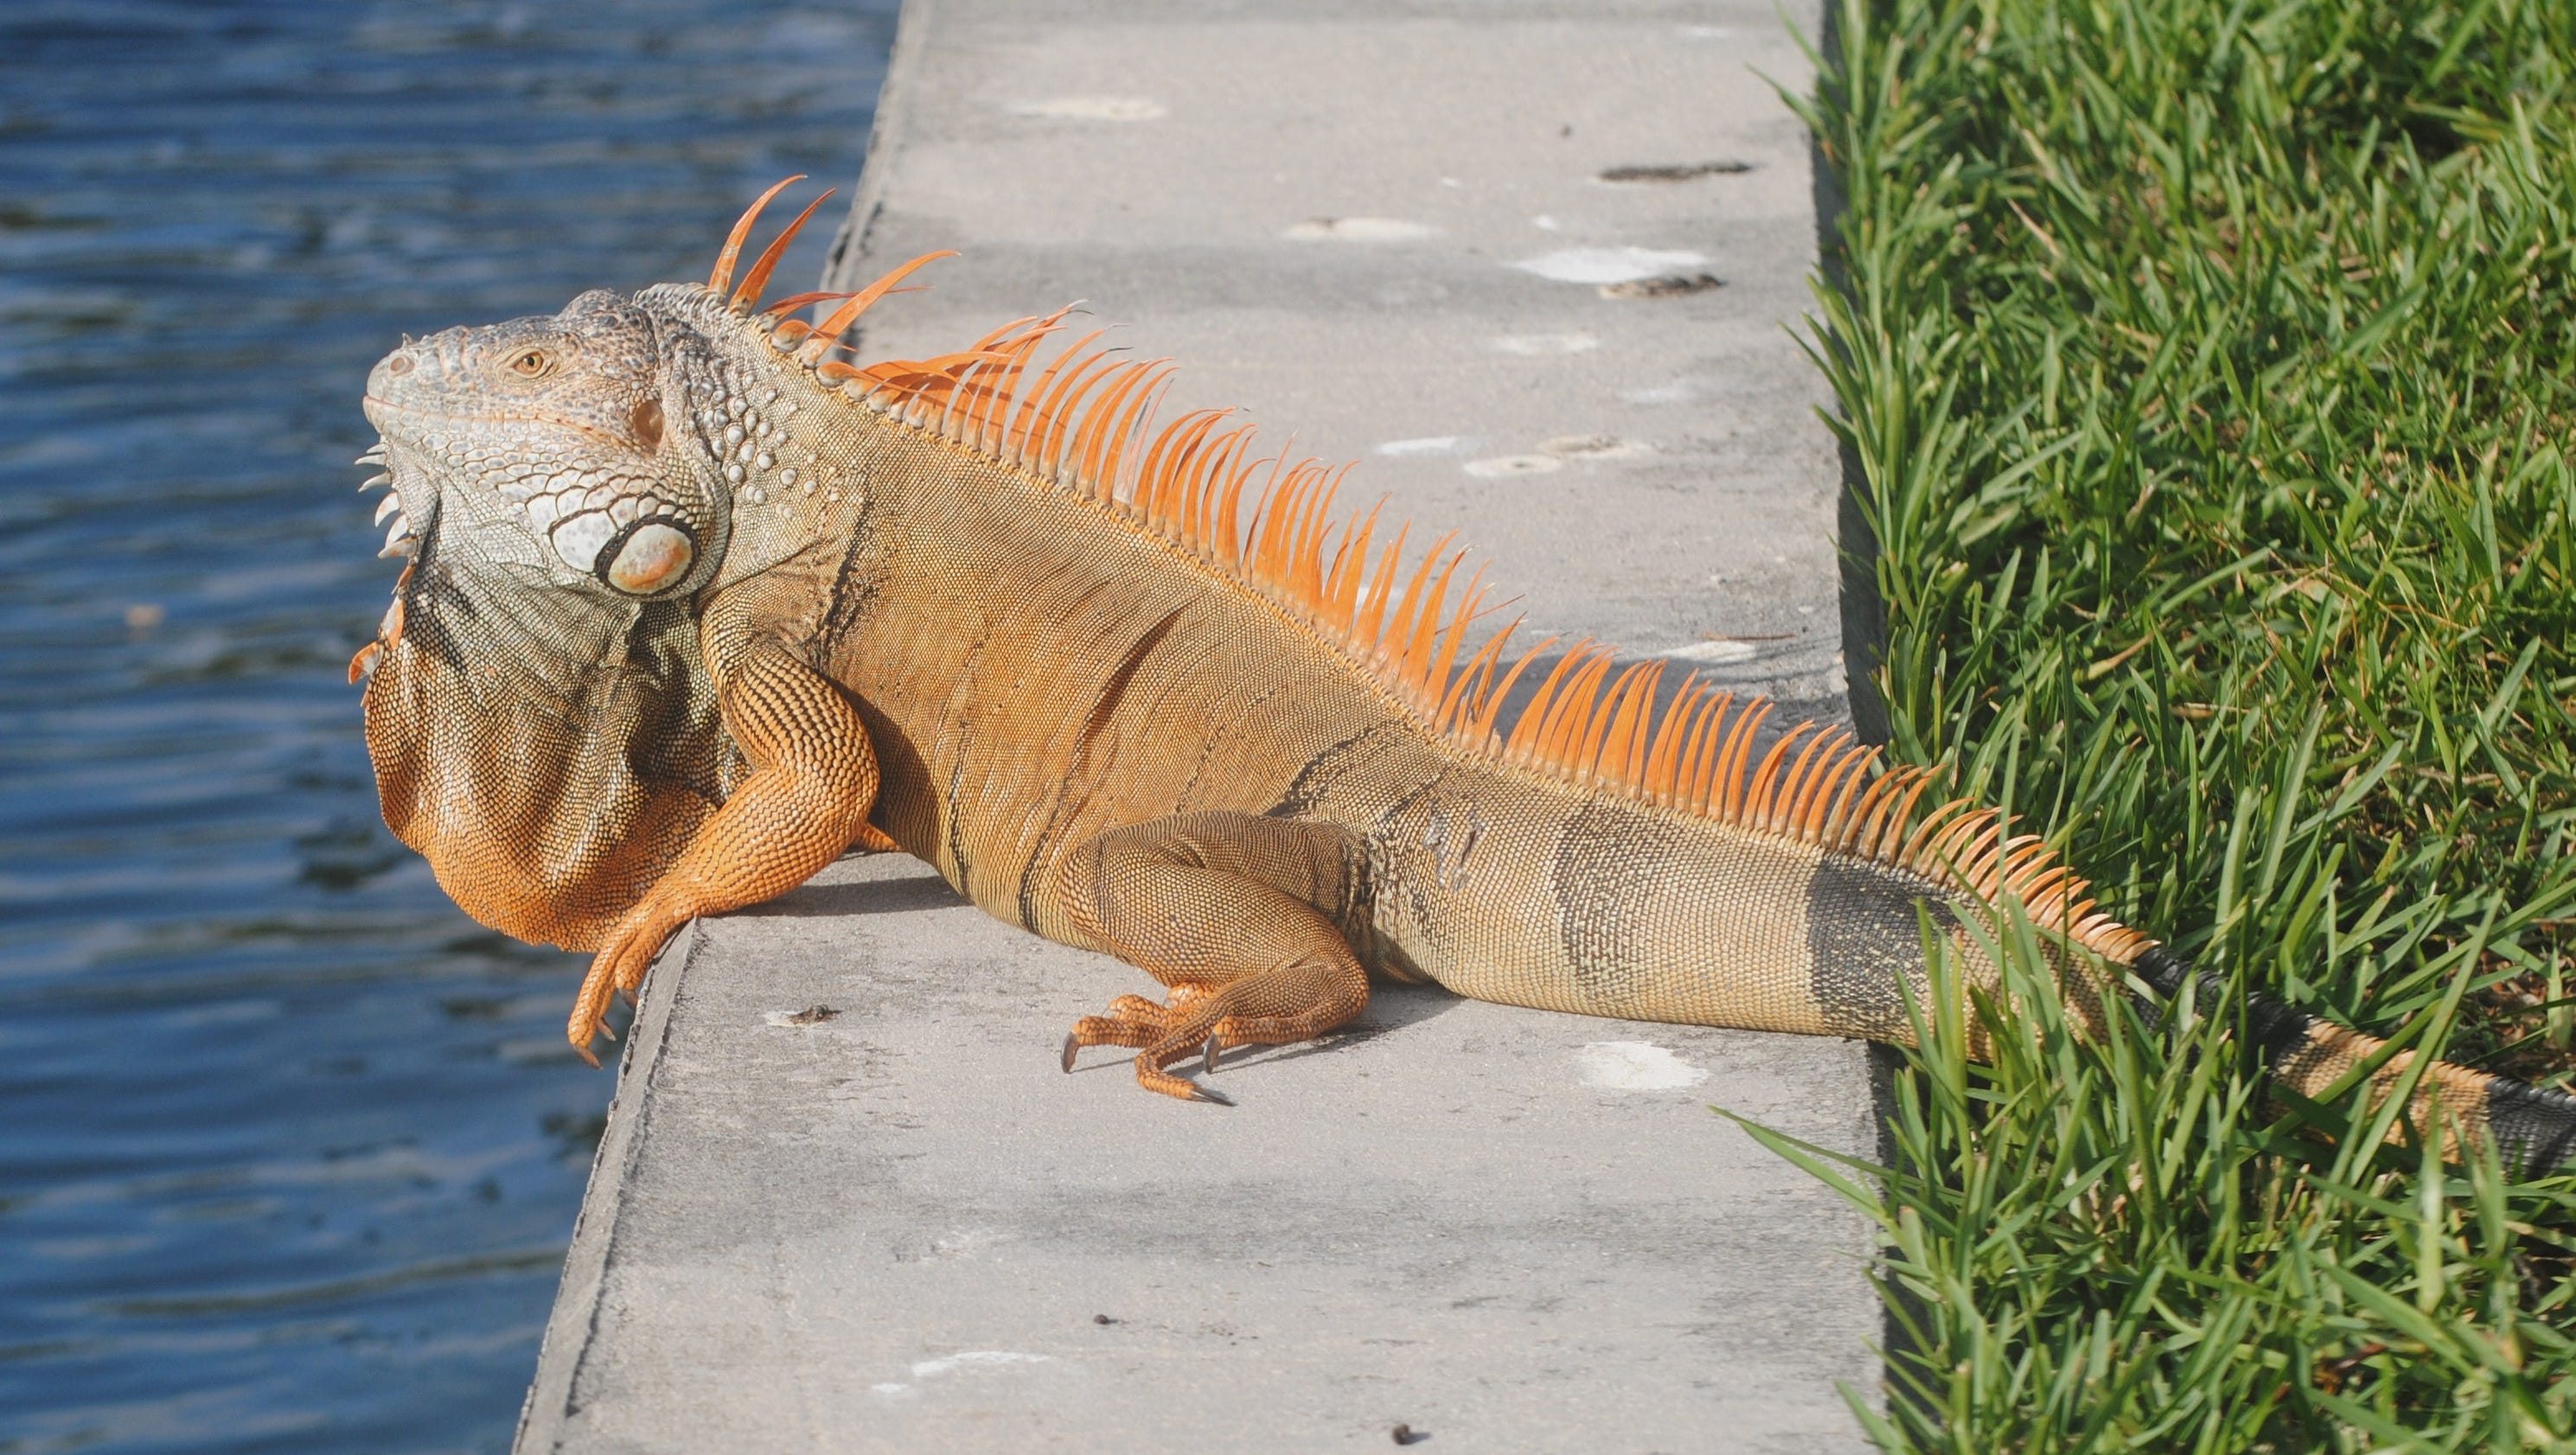 Invasive iguanas on the run from florida fish and wildlife for Florida fish and wildlife jobs